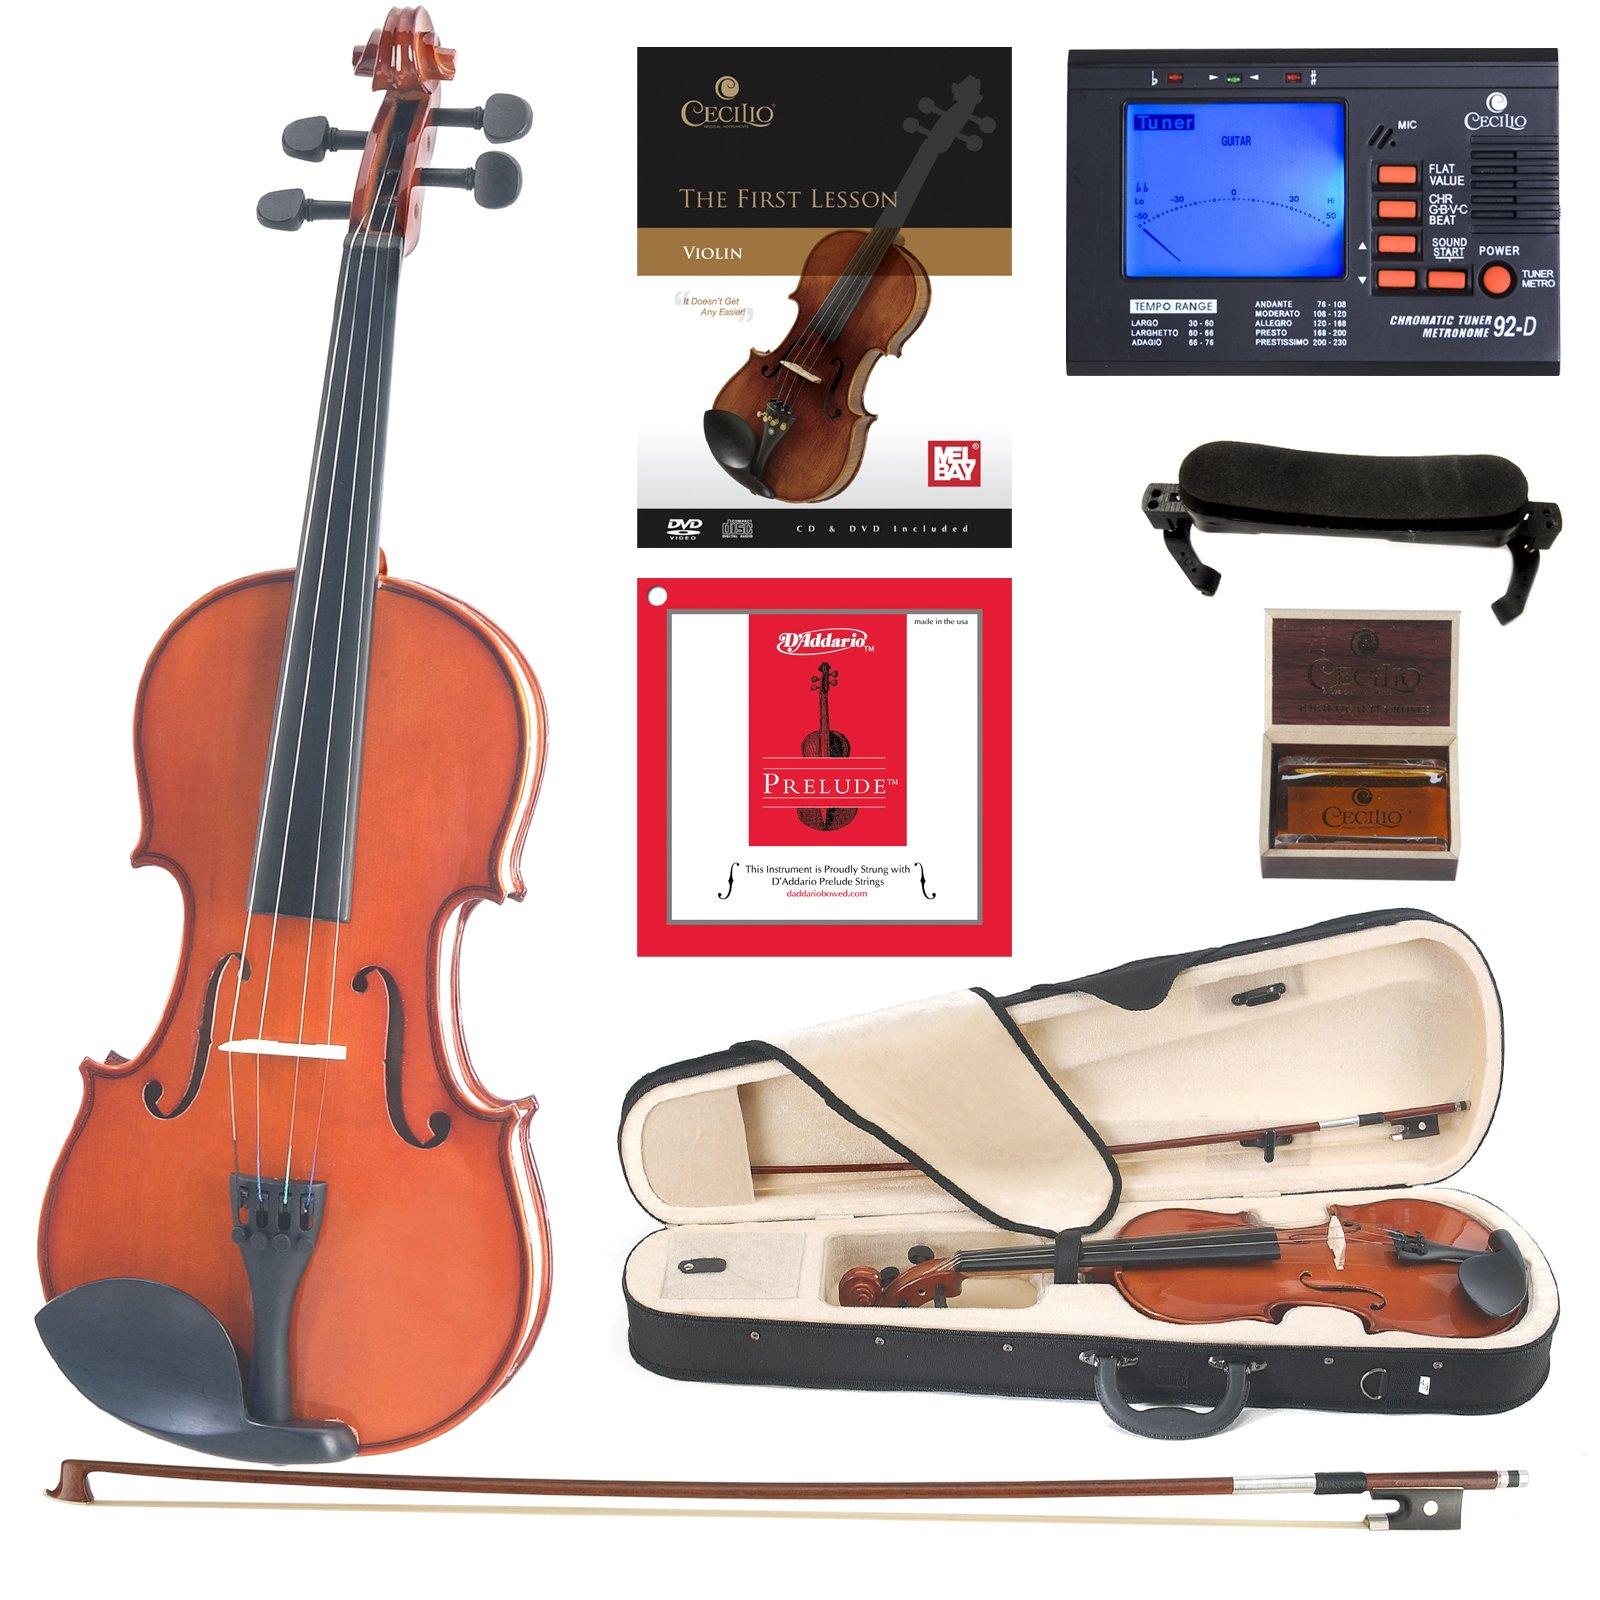 Cecilio CVN-100 Solidwood Student Violin with D'Addario Prelude Strings, Size 4/4 (Full Size) by Cecilio